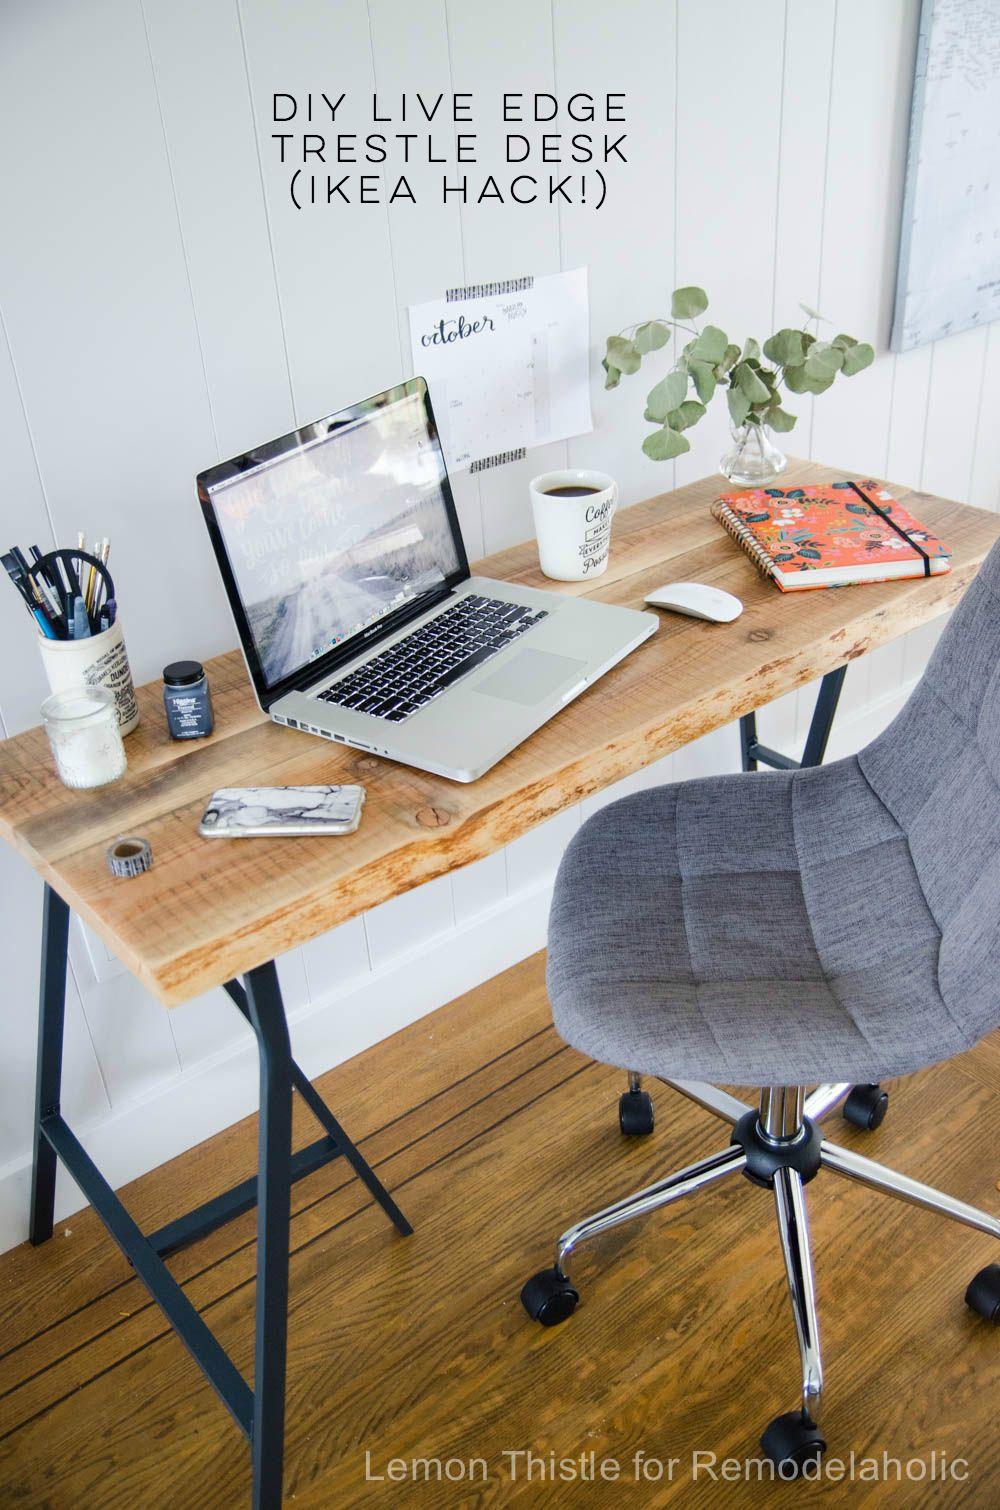 Diy Live Edge Desk With Trestle Legs I Can T Believe It S An Ikea